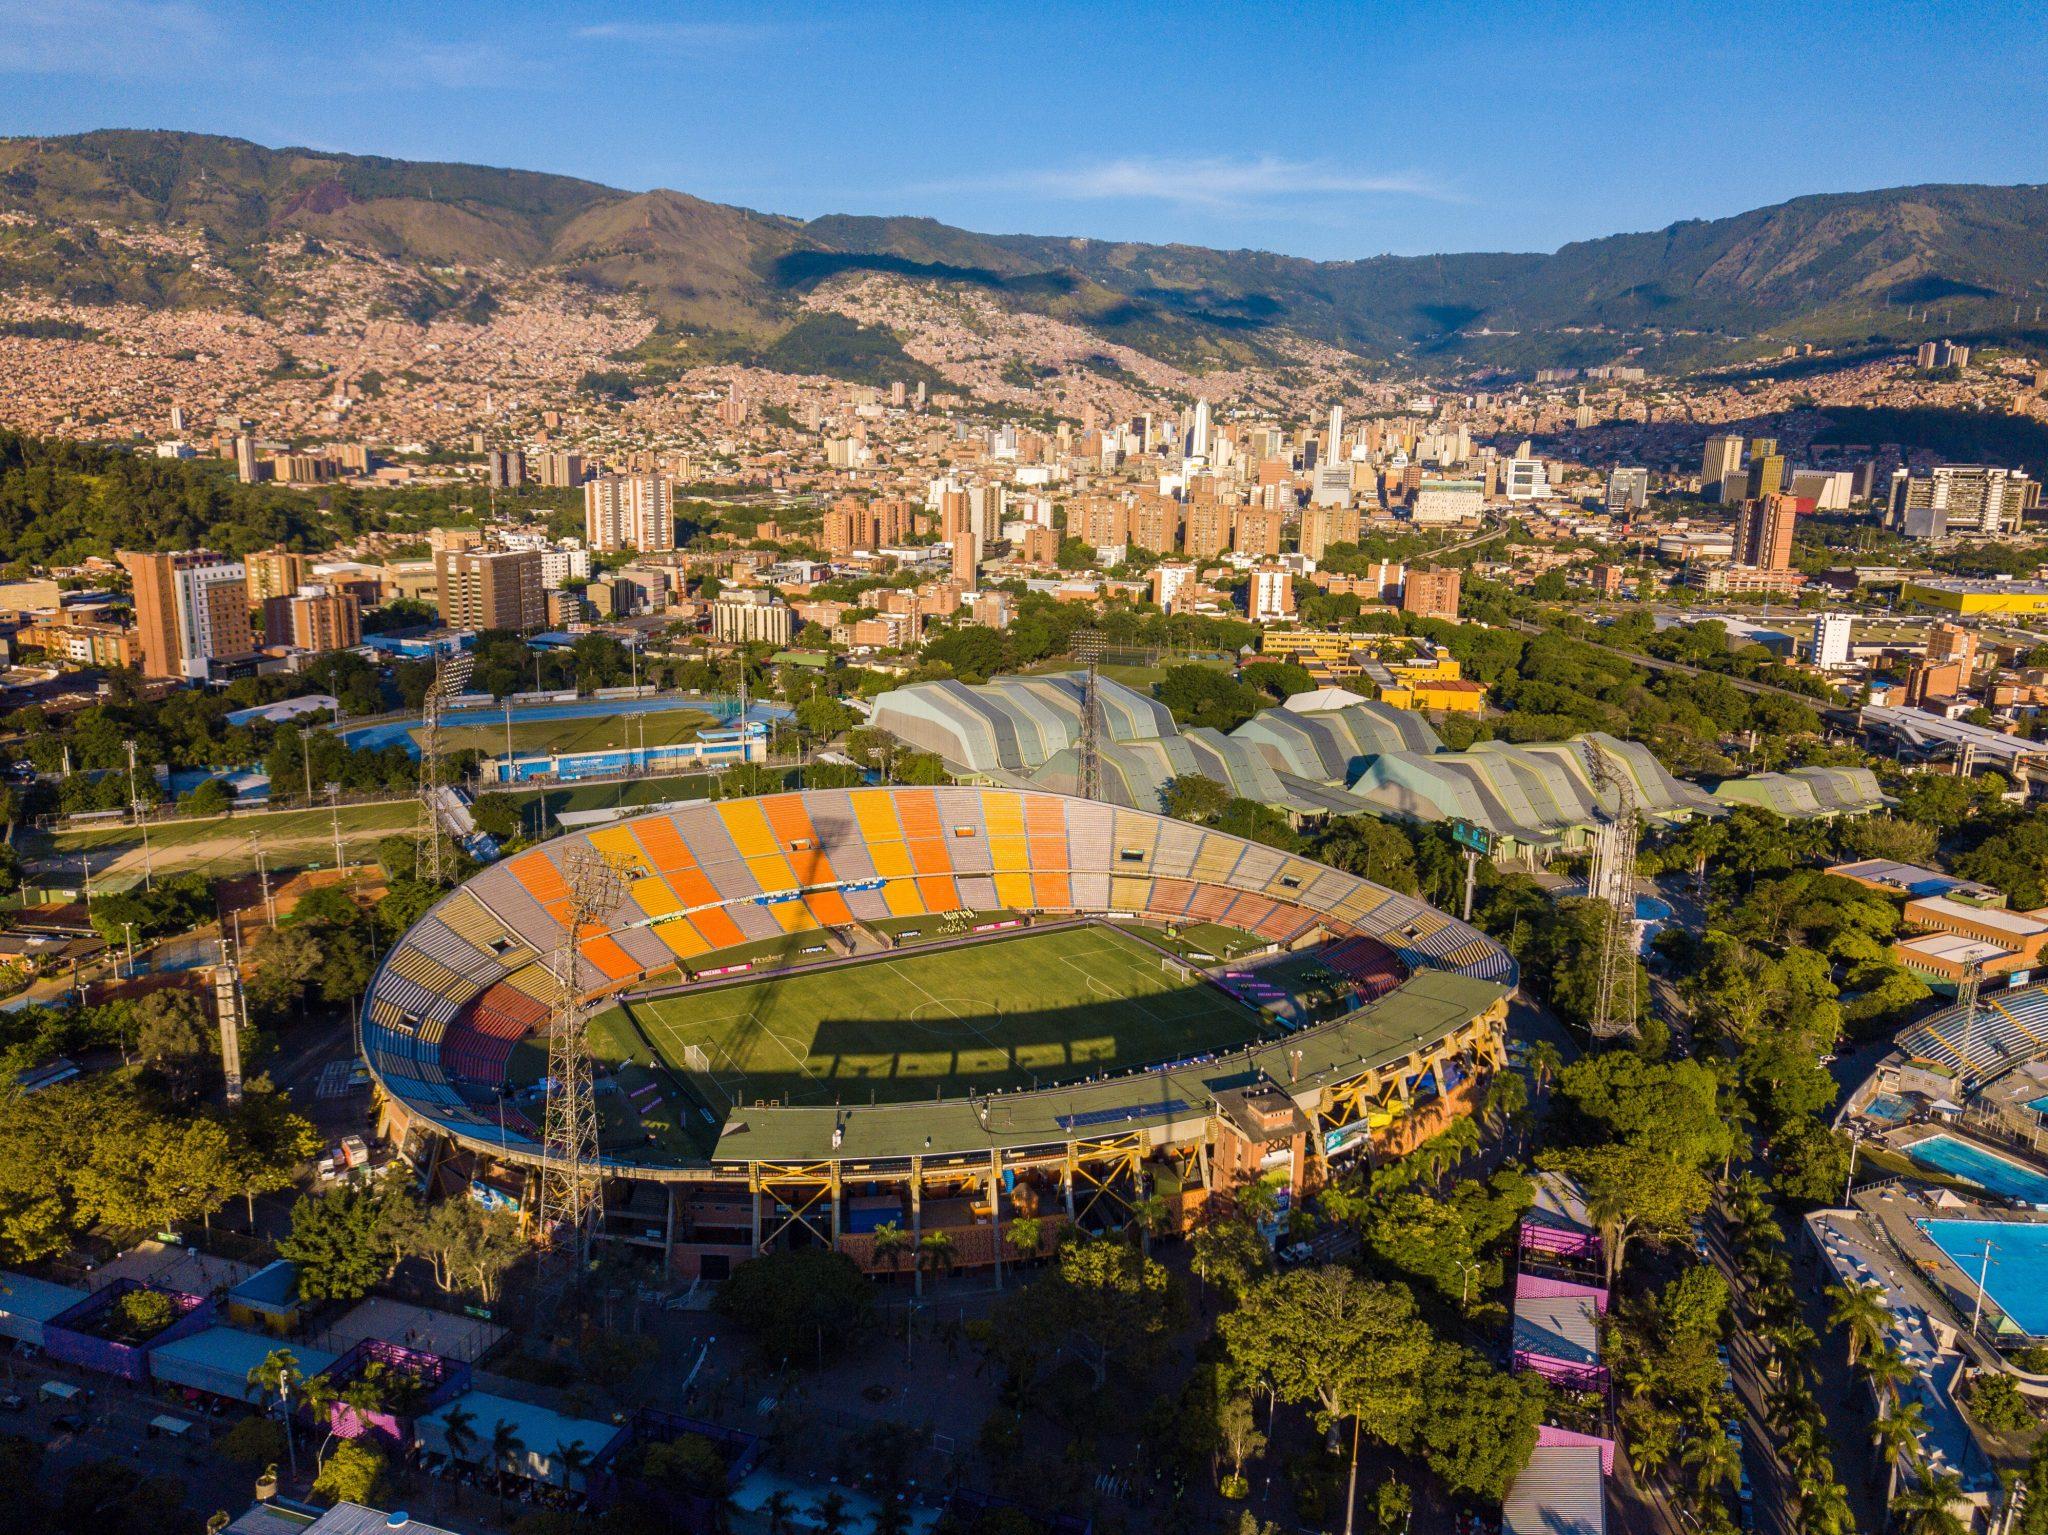 Medellin Backpacking: The Best Part of Medellin